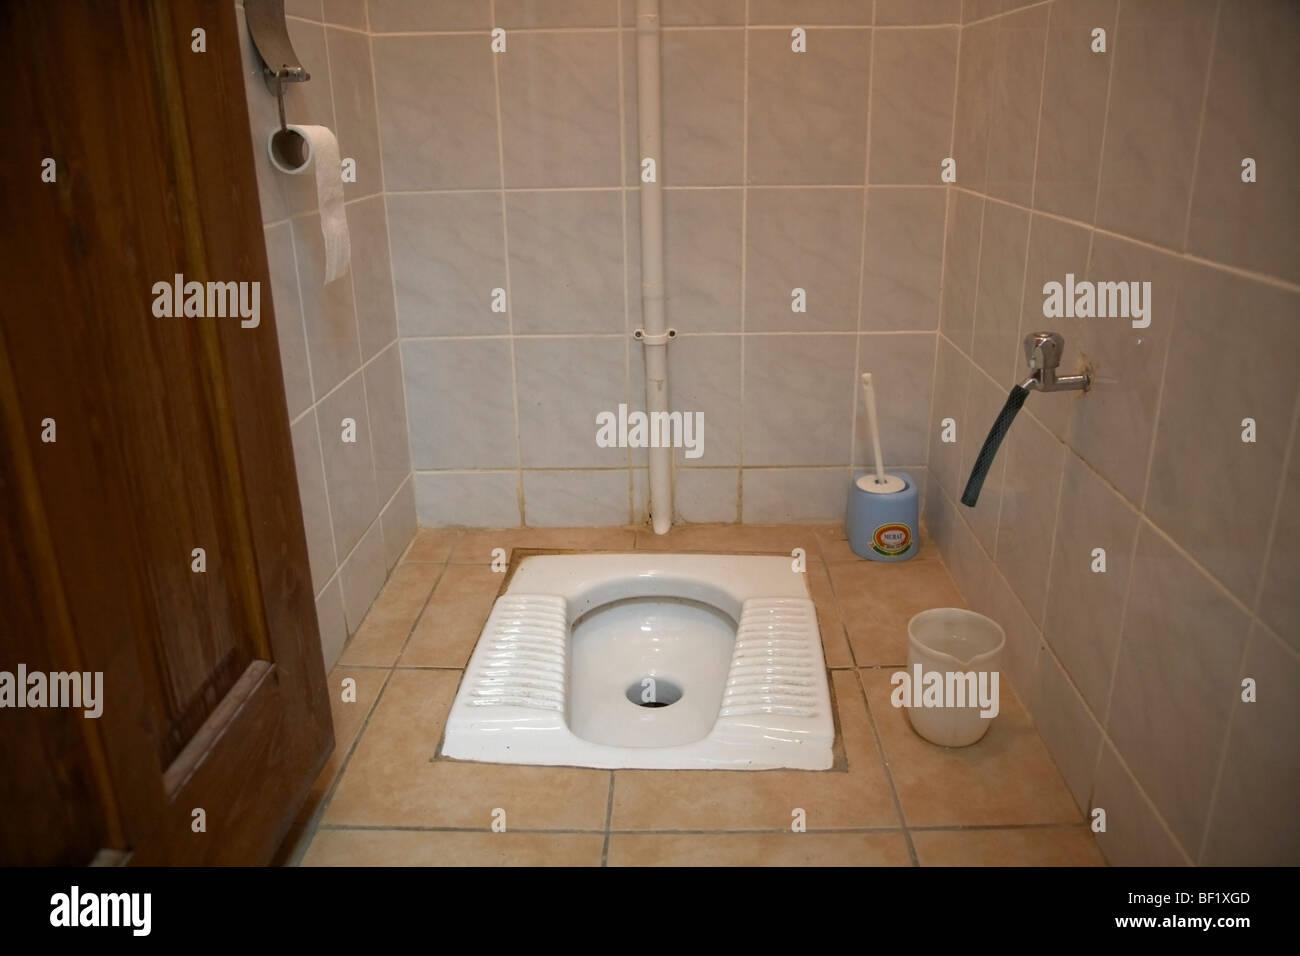 Turkish Toilet Photos Turkish Toilet Images Alamy